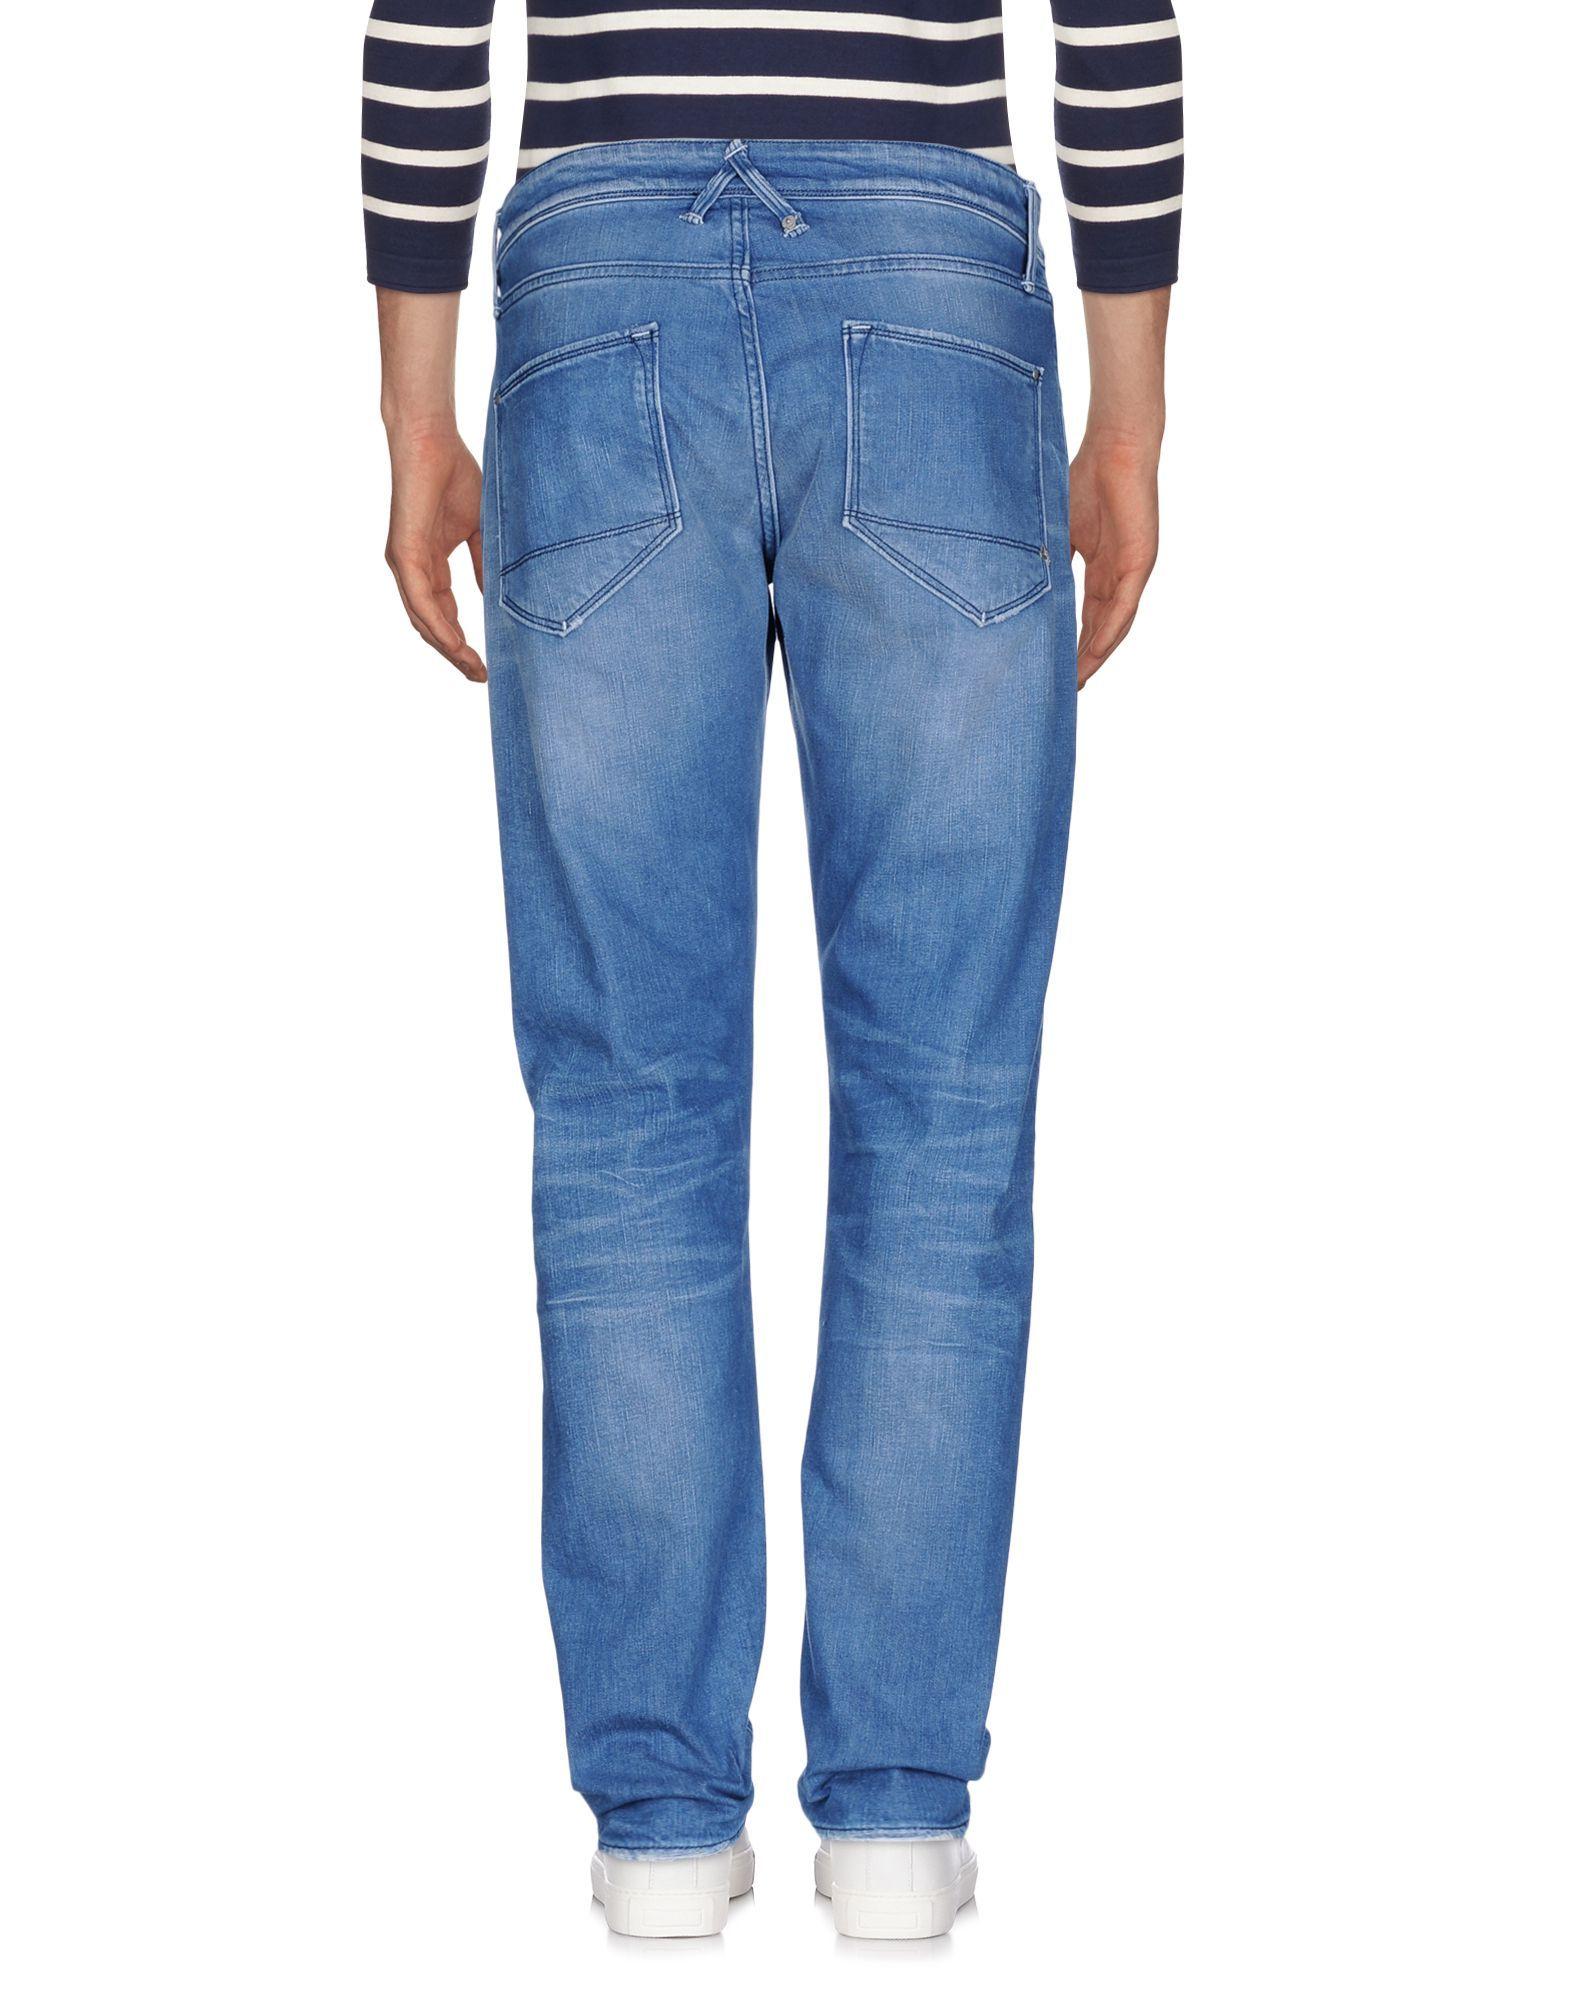 Cycle Blue Cotton Jeans